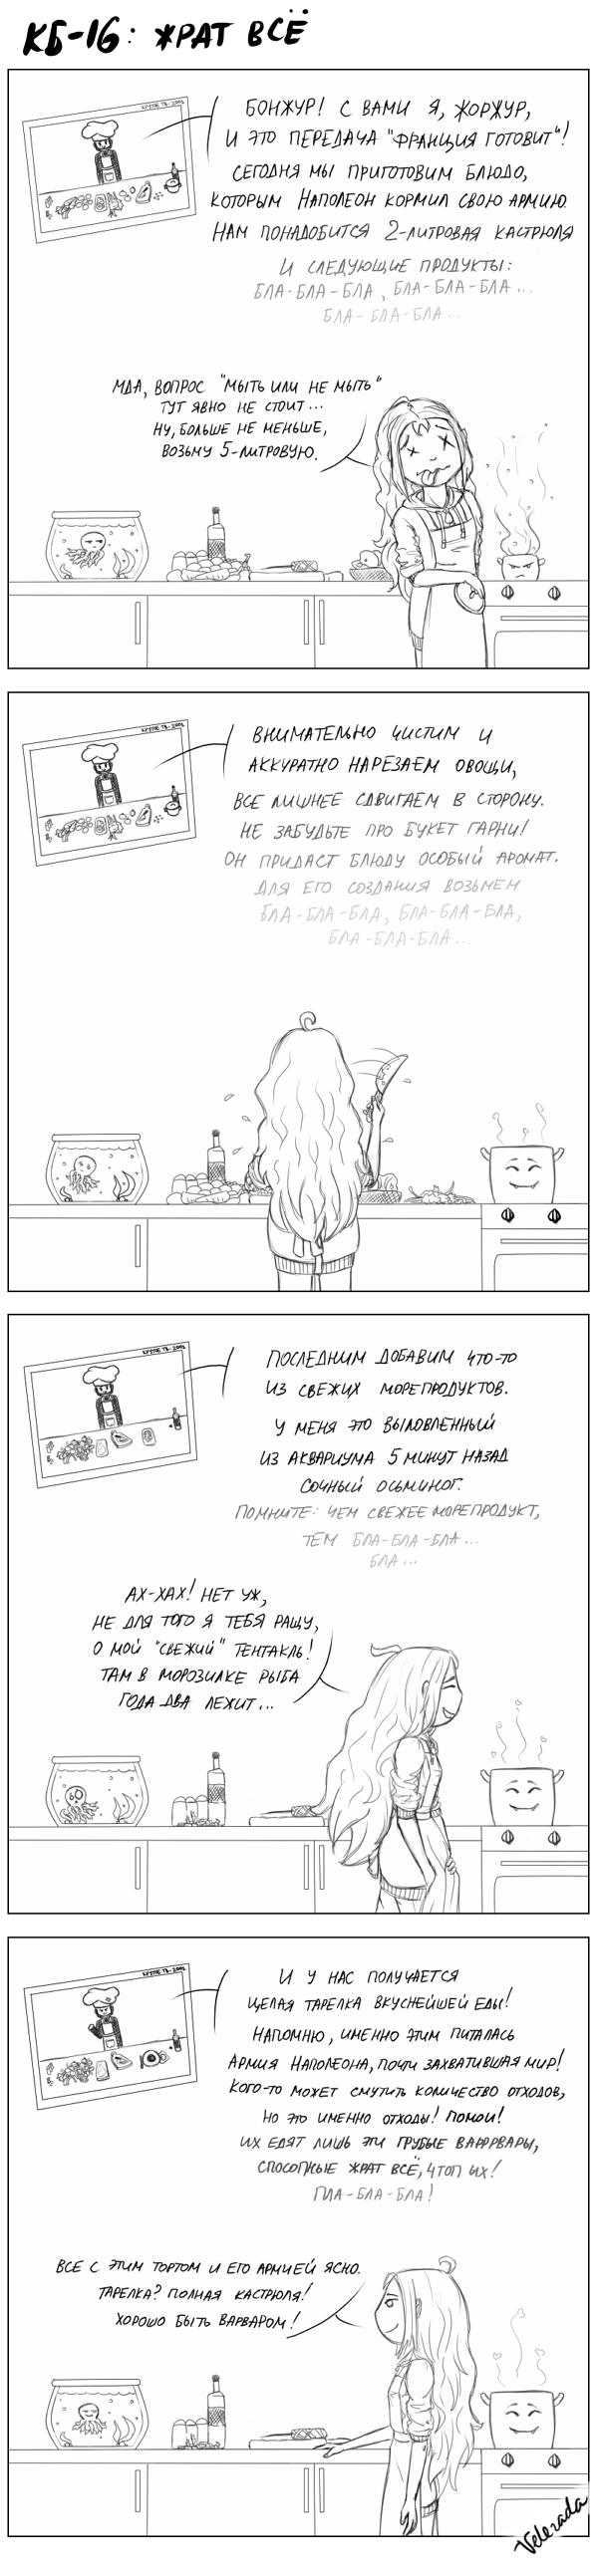 Комикс битва №16 выпуск 56